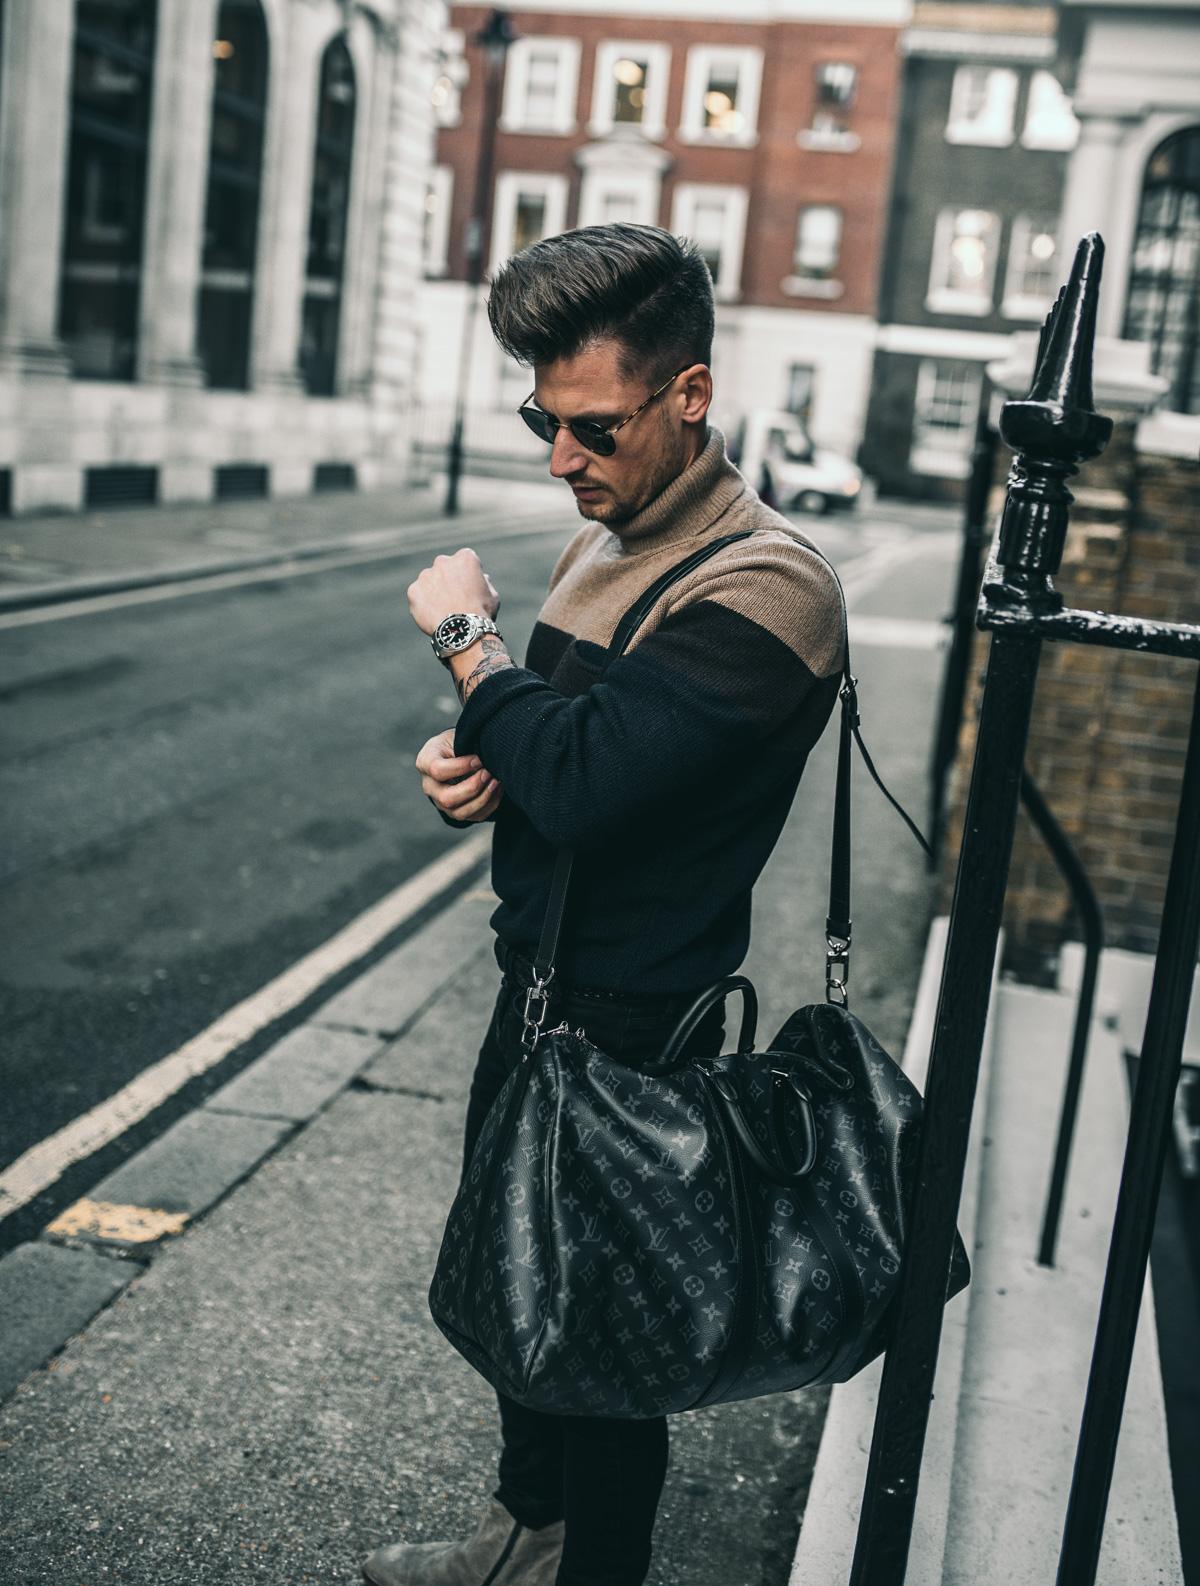 Tommeezjerry-Lifestyleblog-Fashionblog-Maennermodeblog-Maennerblog-Modeblog-London-Brax-FeelGood-Herbstlook-Winterlook-Sweater-Turtleneck-Autumnlook